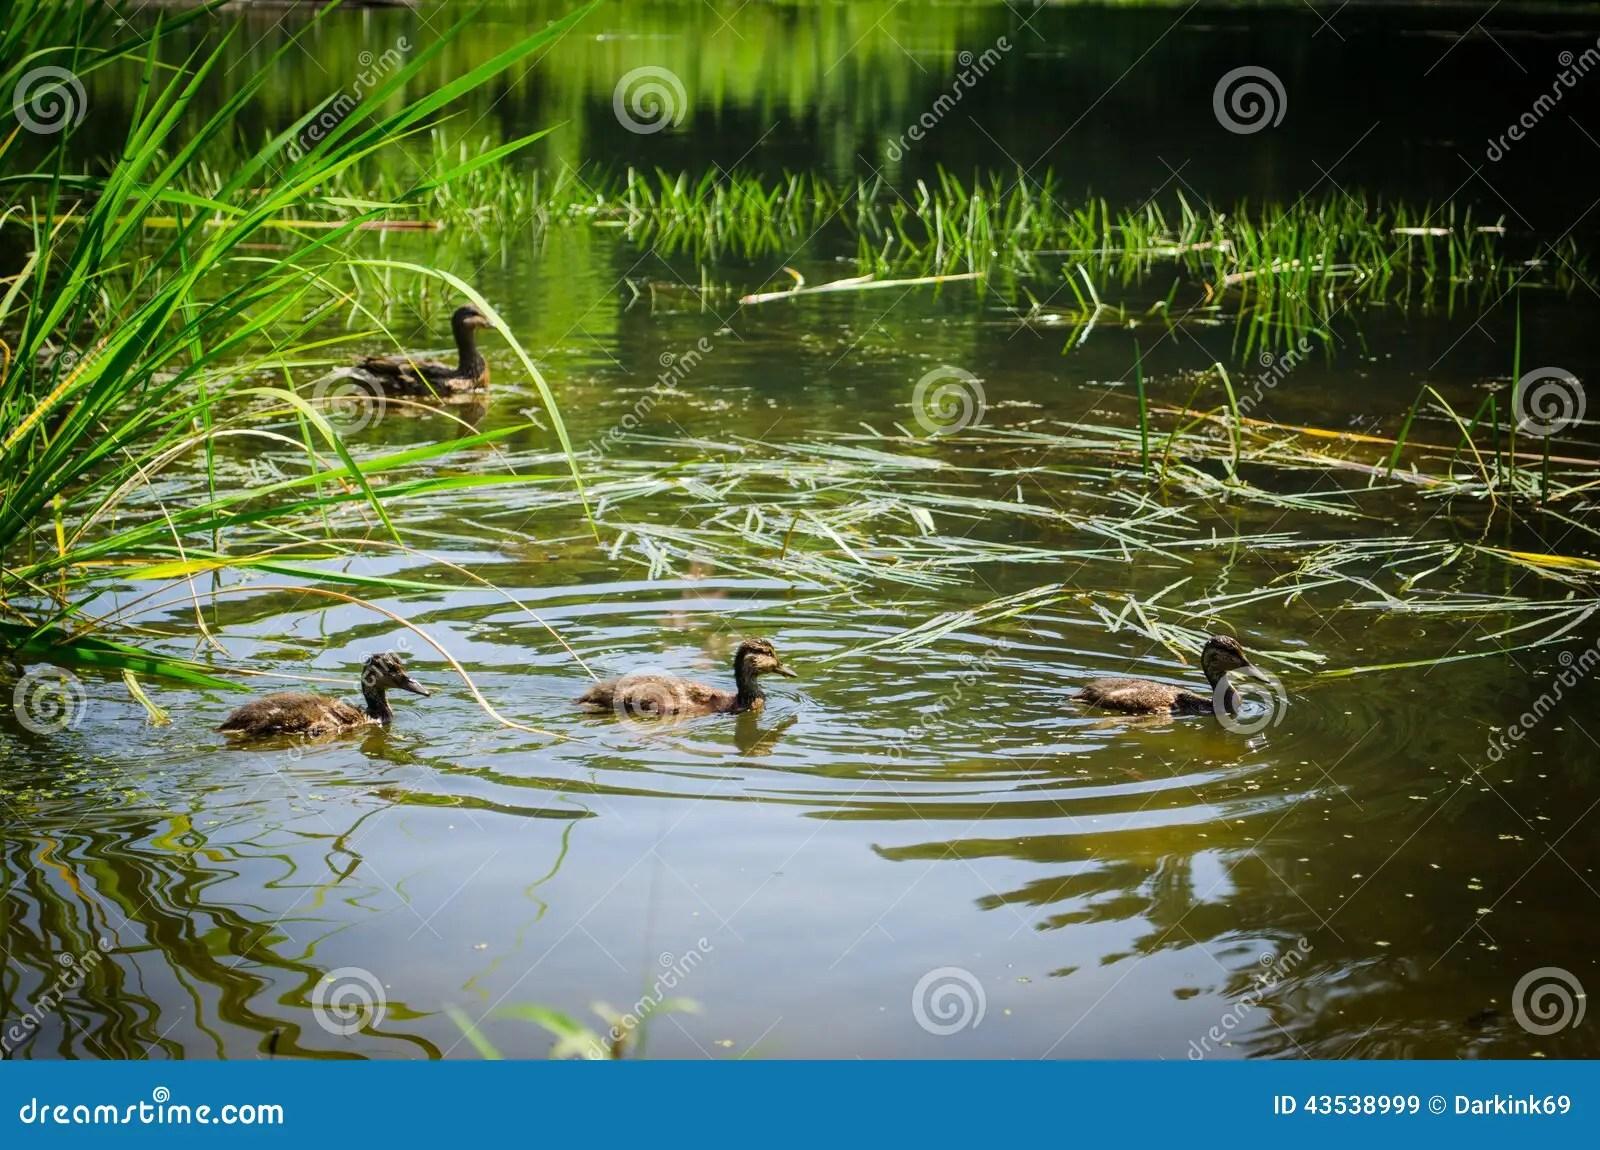 Ducks Swimming In Pond Stock Photo Image 43538999